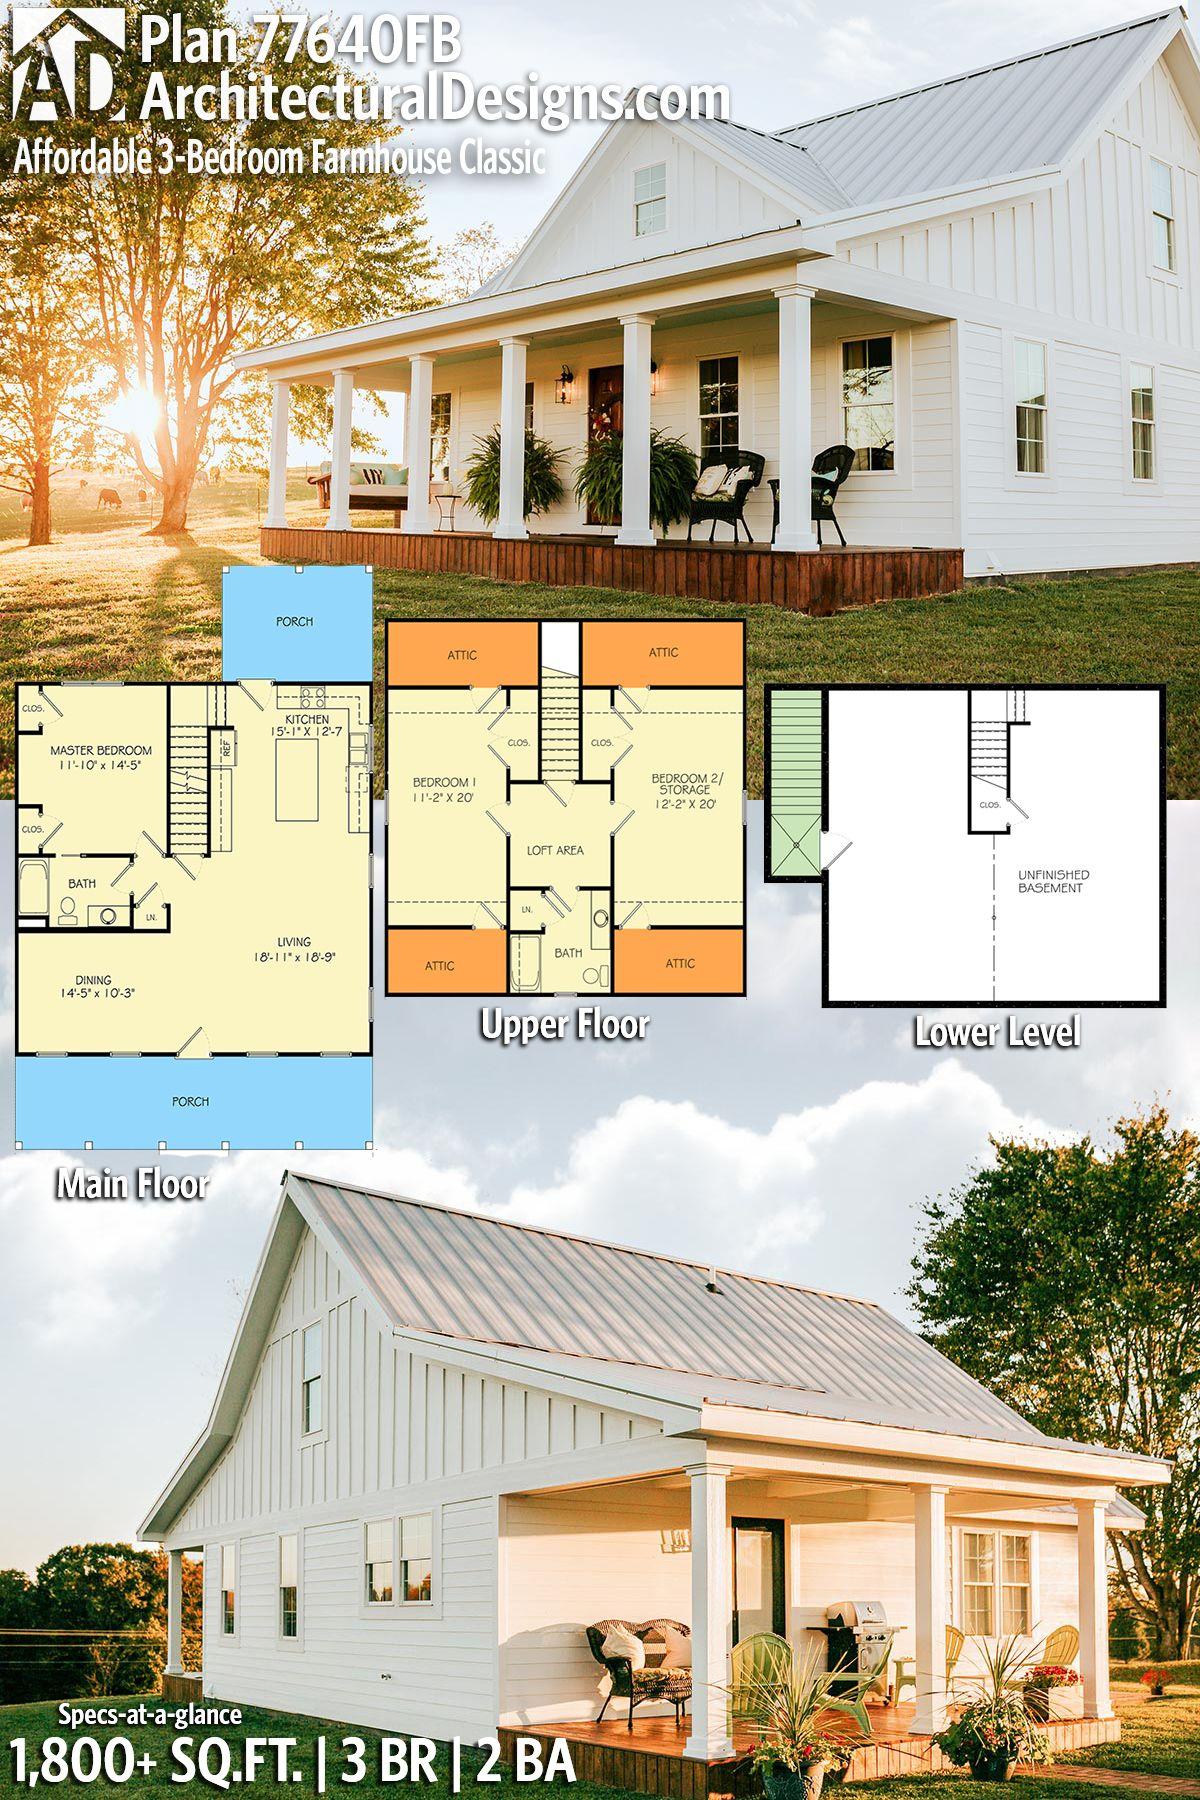 Architectural Designs Affordable Farmhouse Classic Plan FB